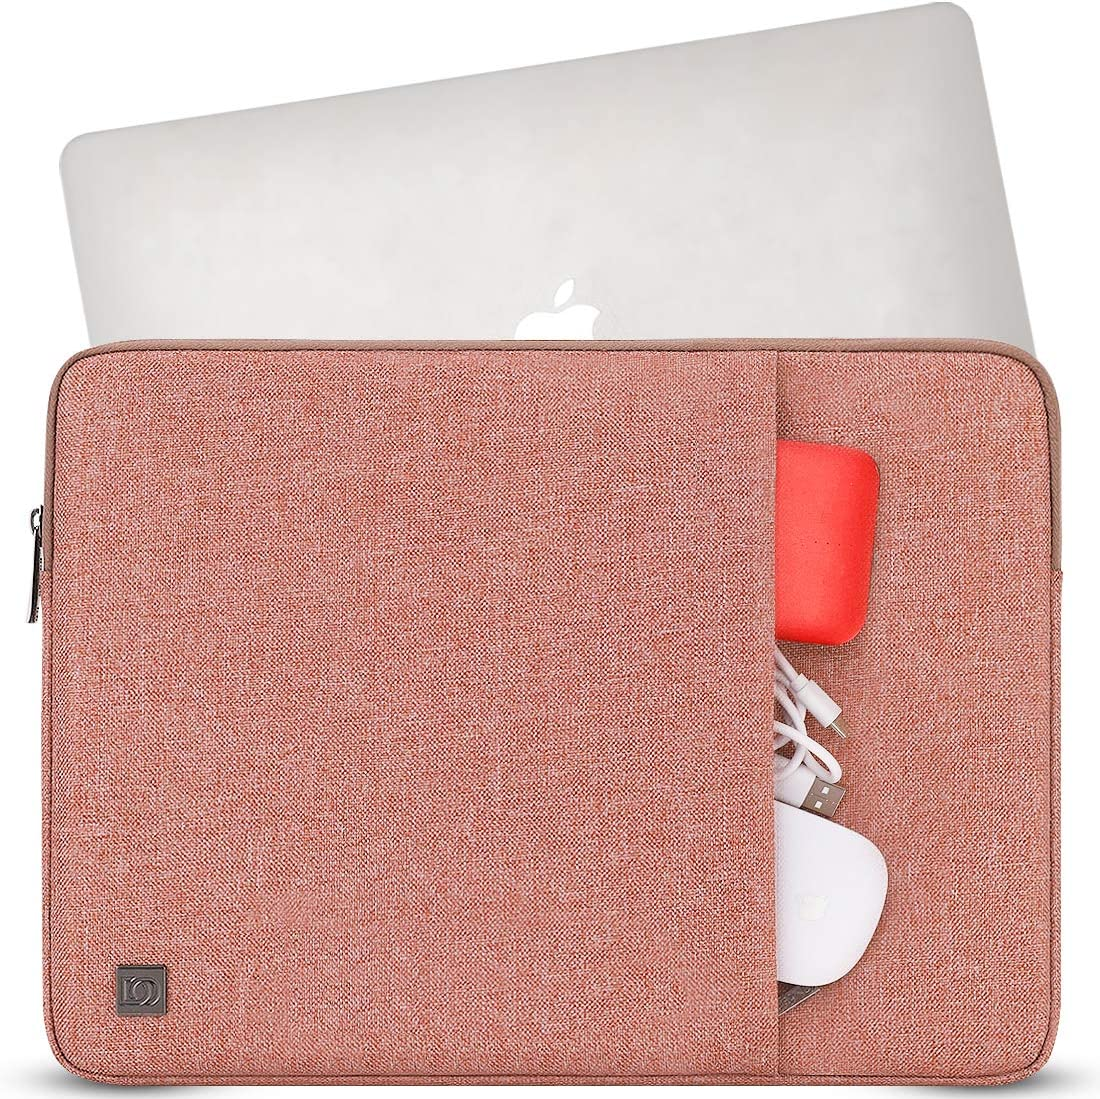 DOMISO 10 inch Tablet Laptop Sleeve Case Waterproof Protective Carrying Bag for 9.710.5 11 iPad Pro//10.5 iPad Air//Microsoft Surface Go 2018//Samsung Galaxy Tab S3 S4//Lenovo Ideapad D330 Dark Grey